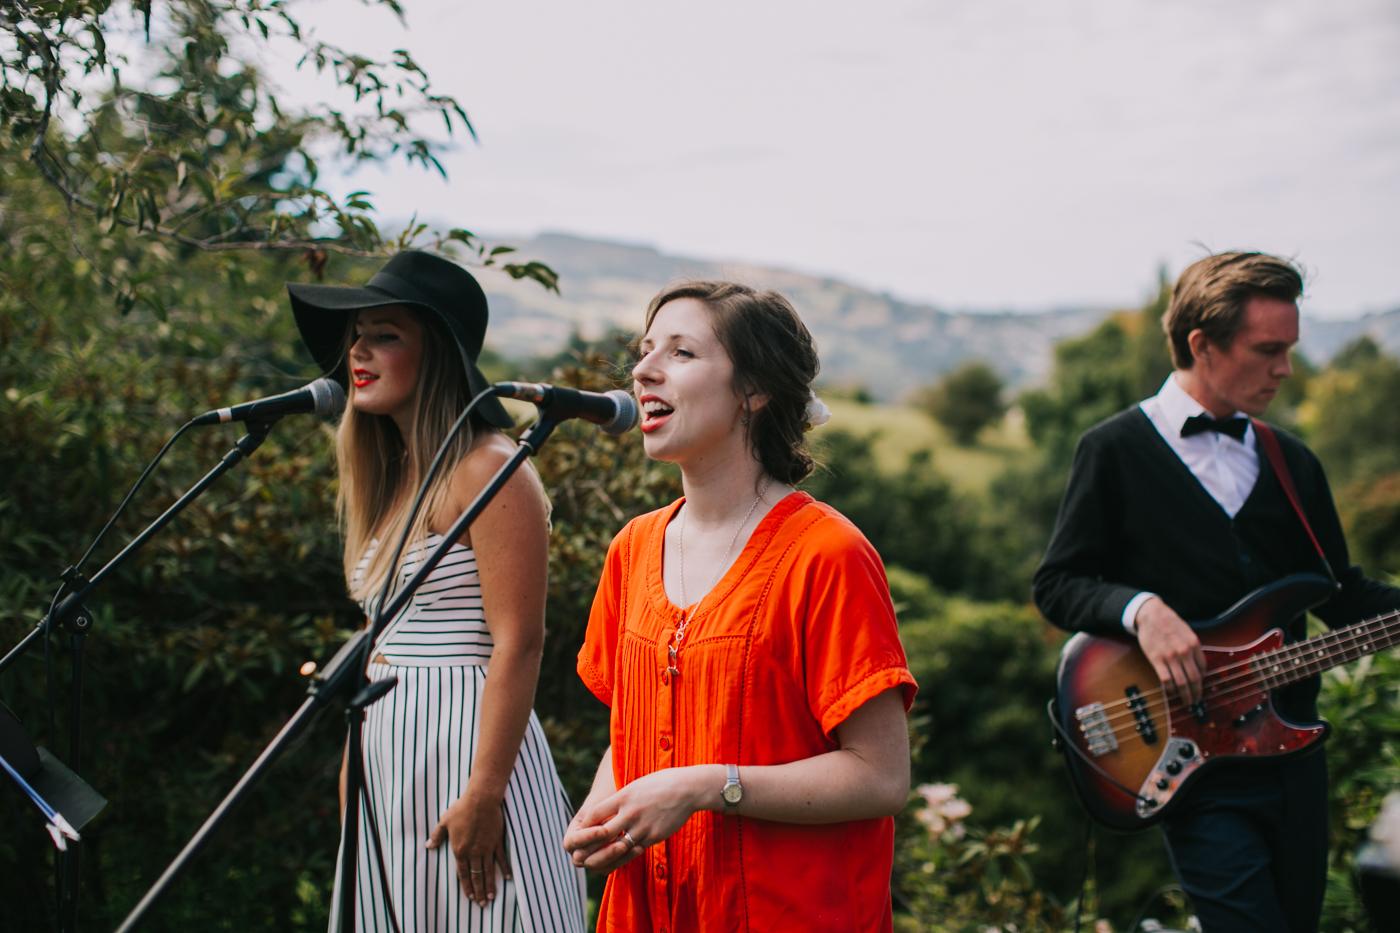 Ariana & Tim - Dunedin, New Zealand Wedding - Destination Wedding - Samantha Heather Photography-93.jpg